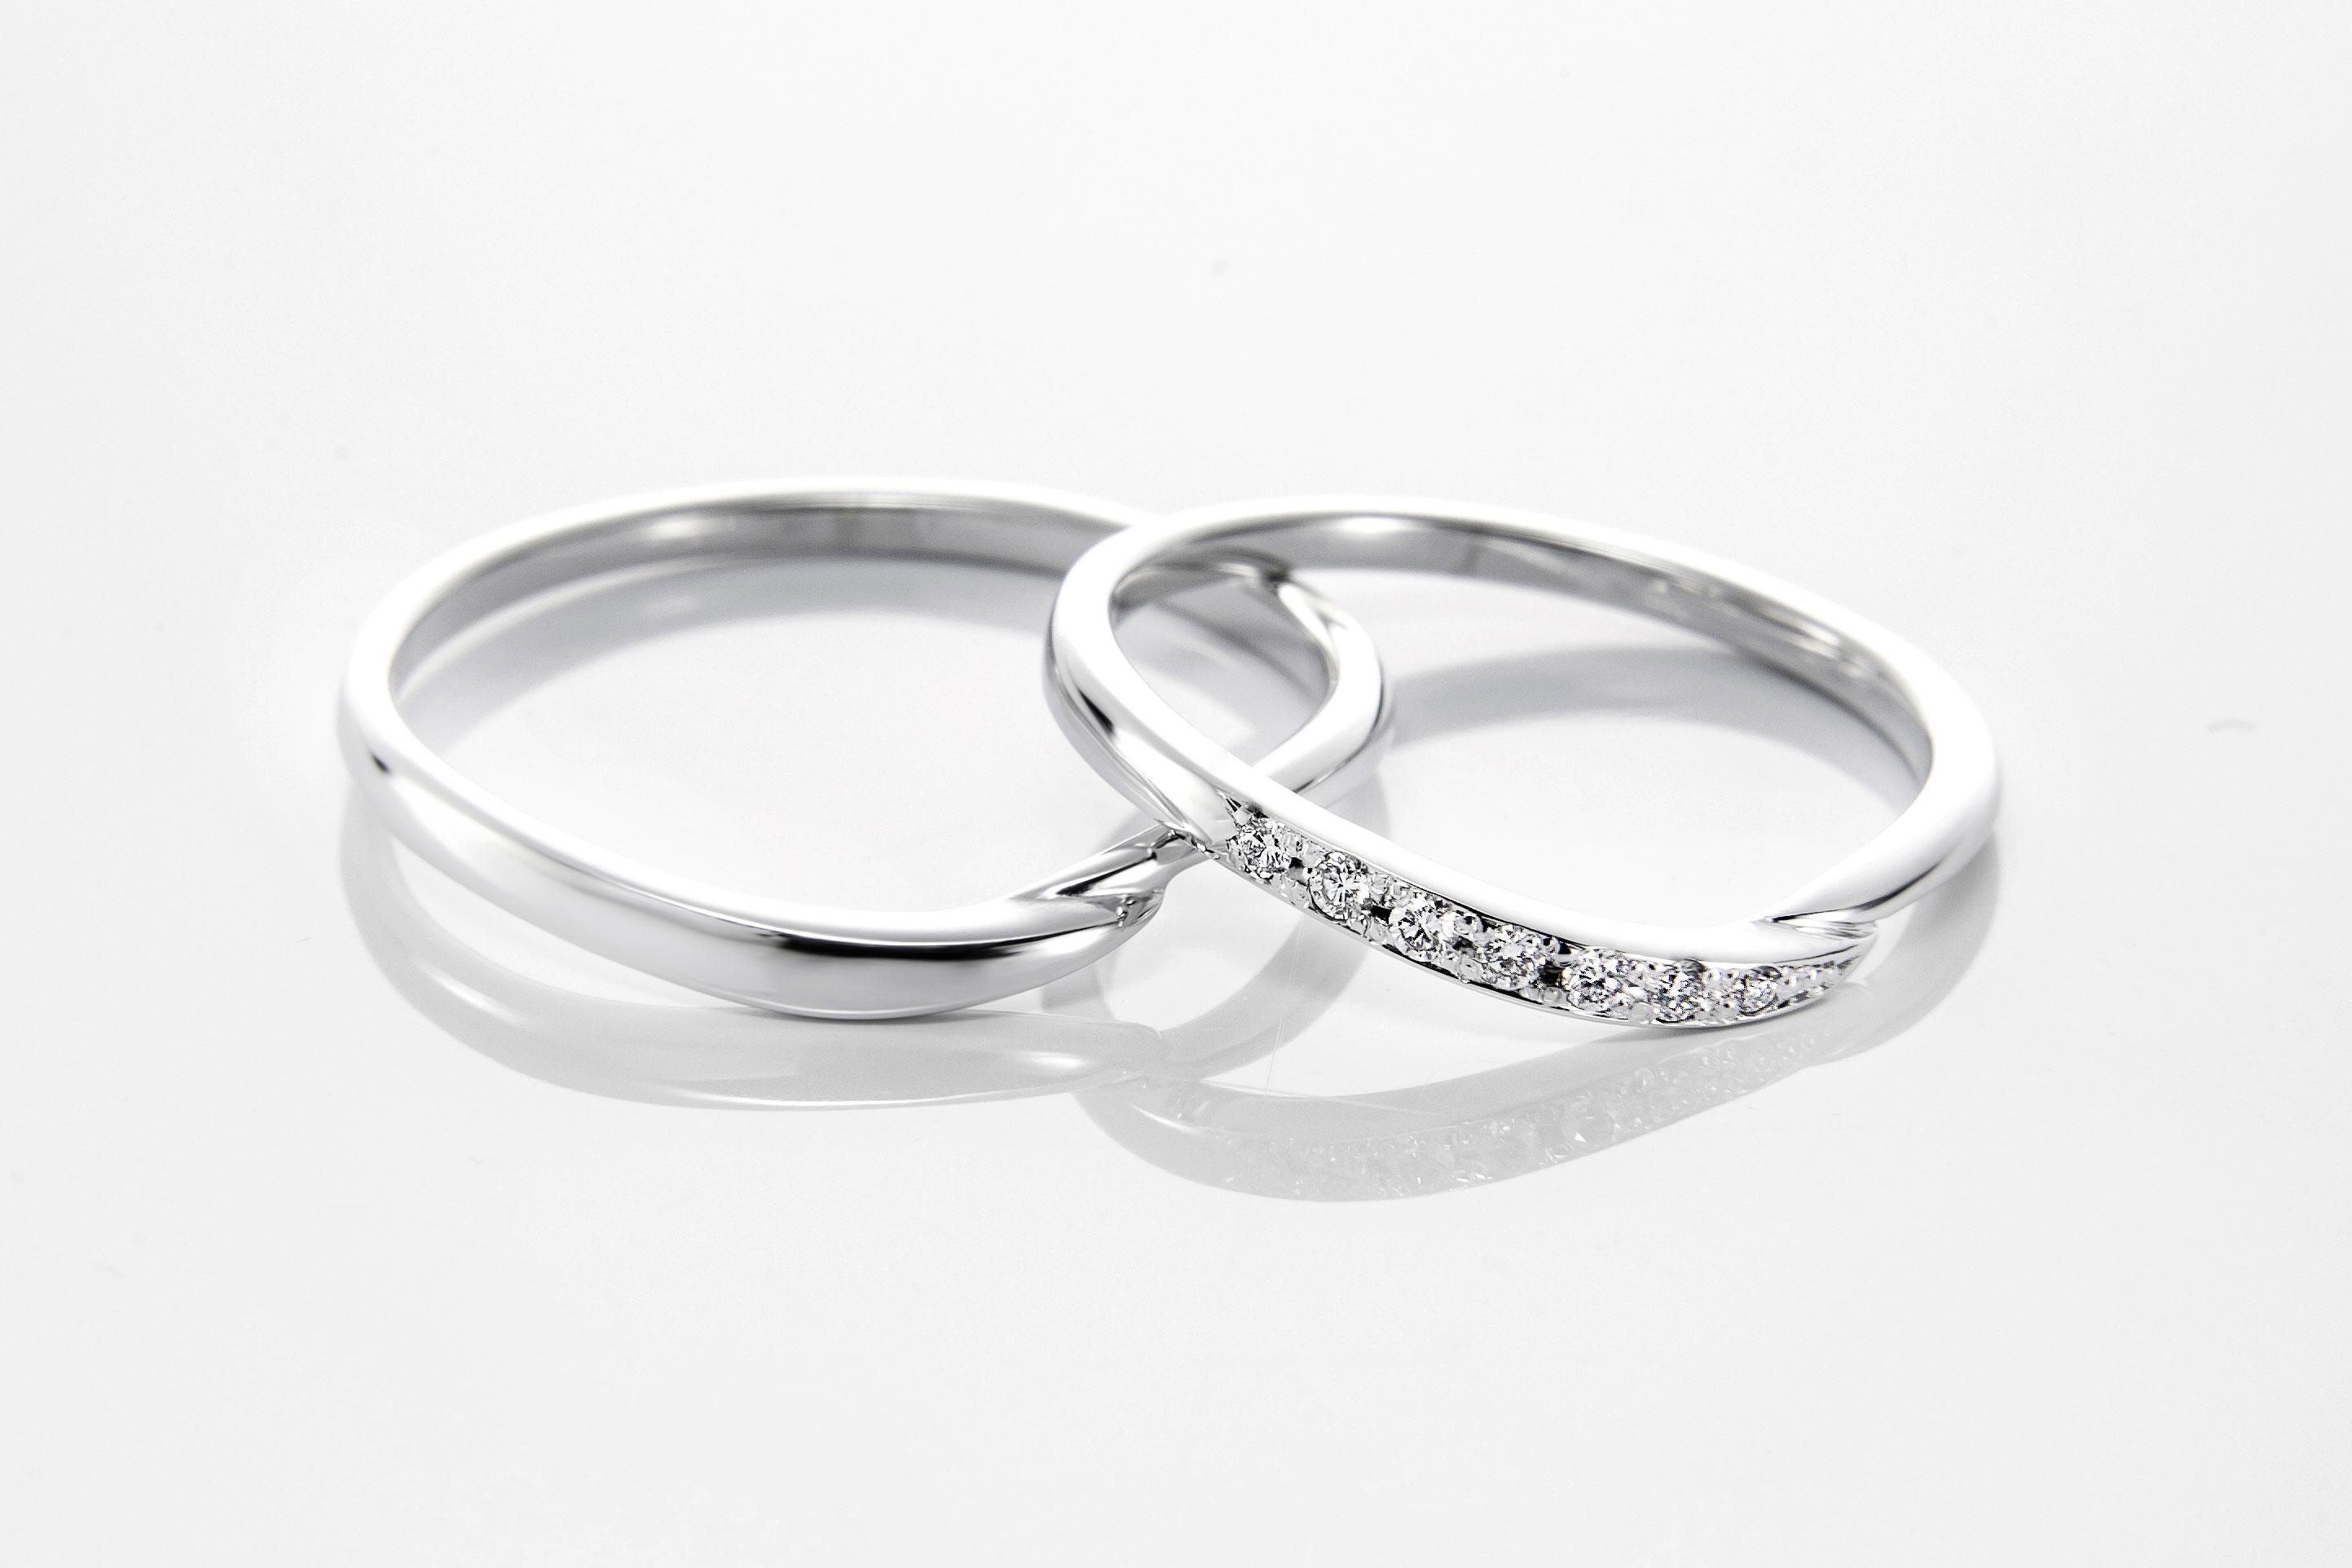 結婚指輪①